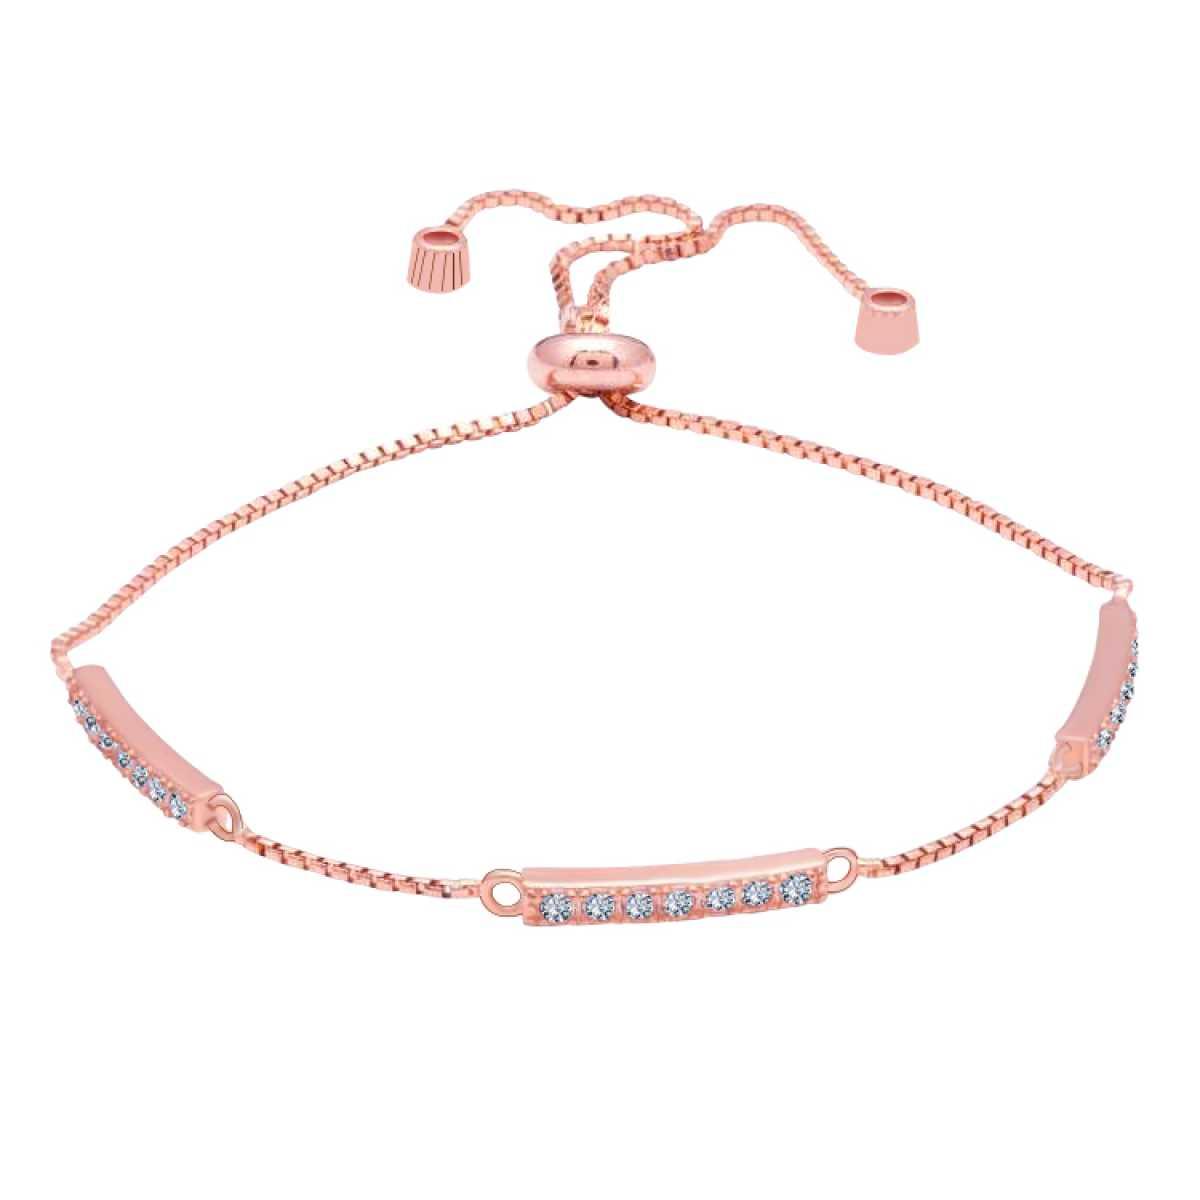 Three Parts & Charming Bracelet